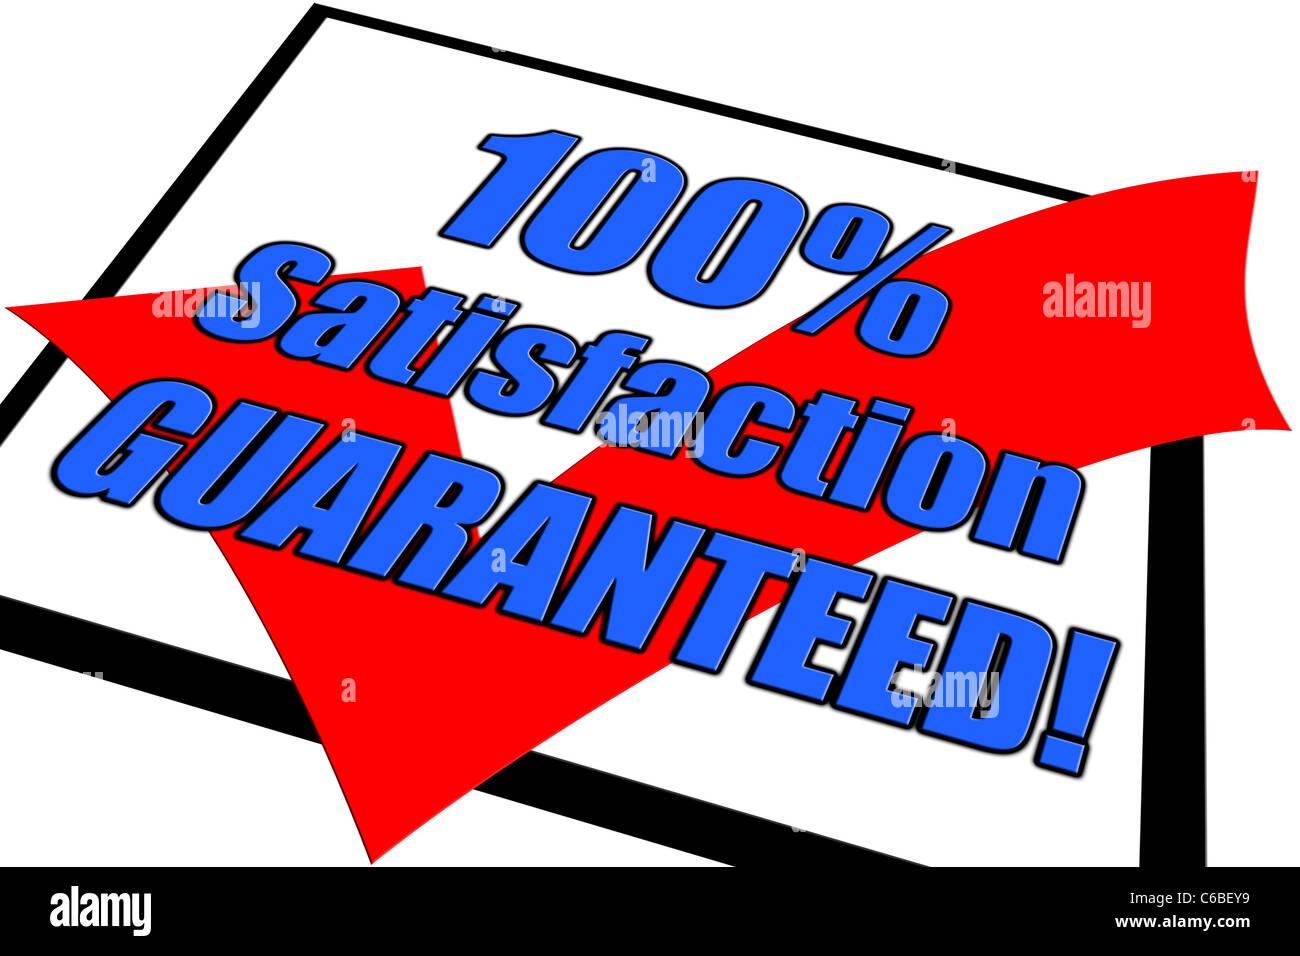 100 % satisfaction garantie concept isolated on white Photo Stock